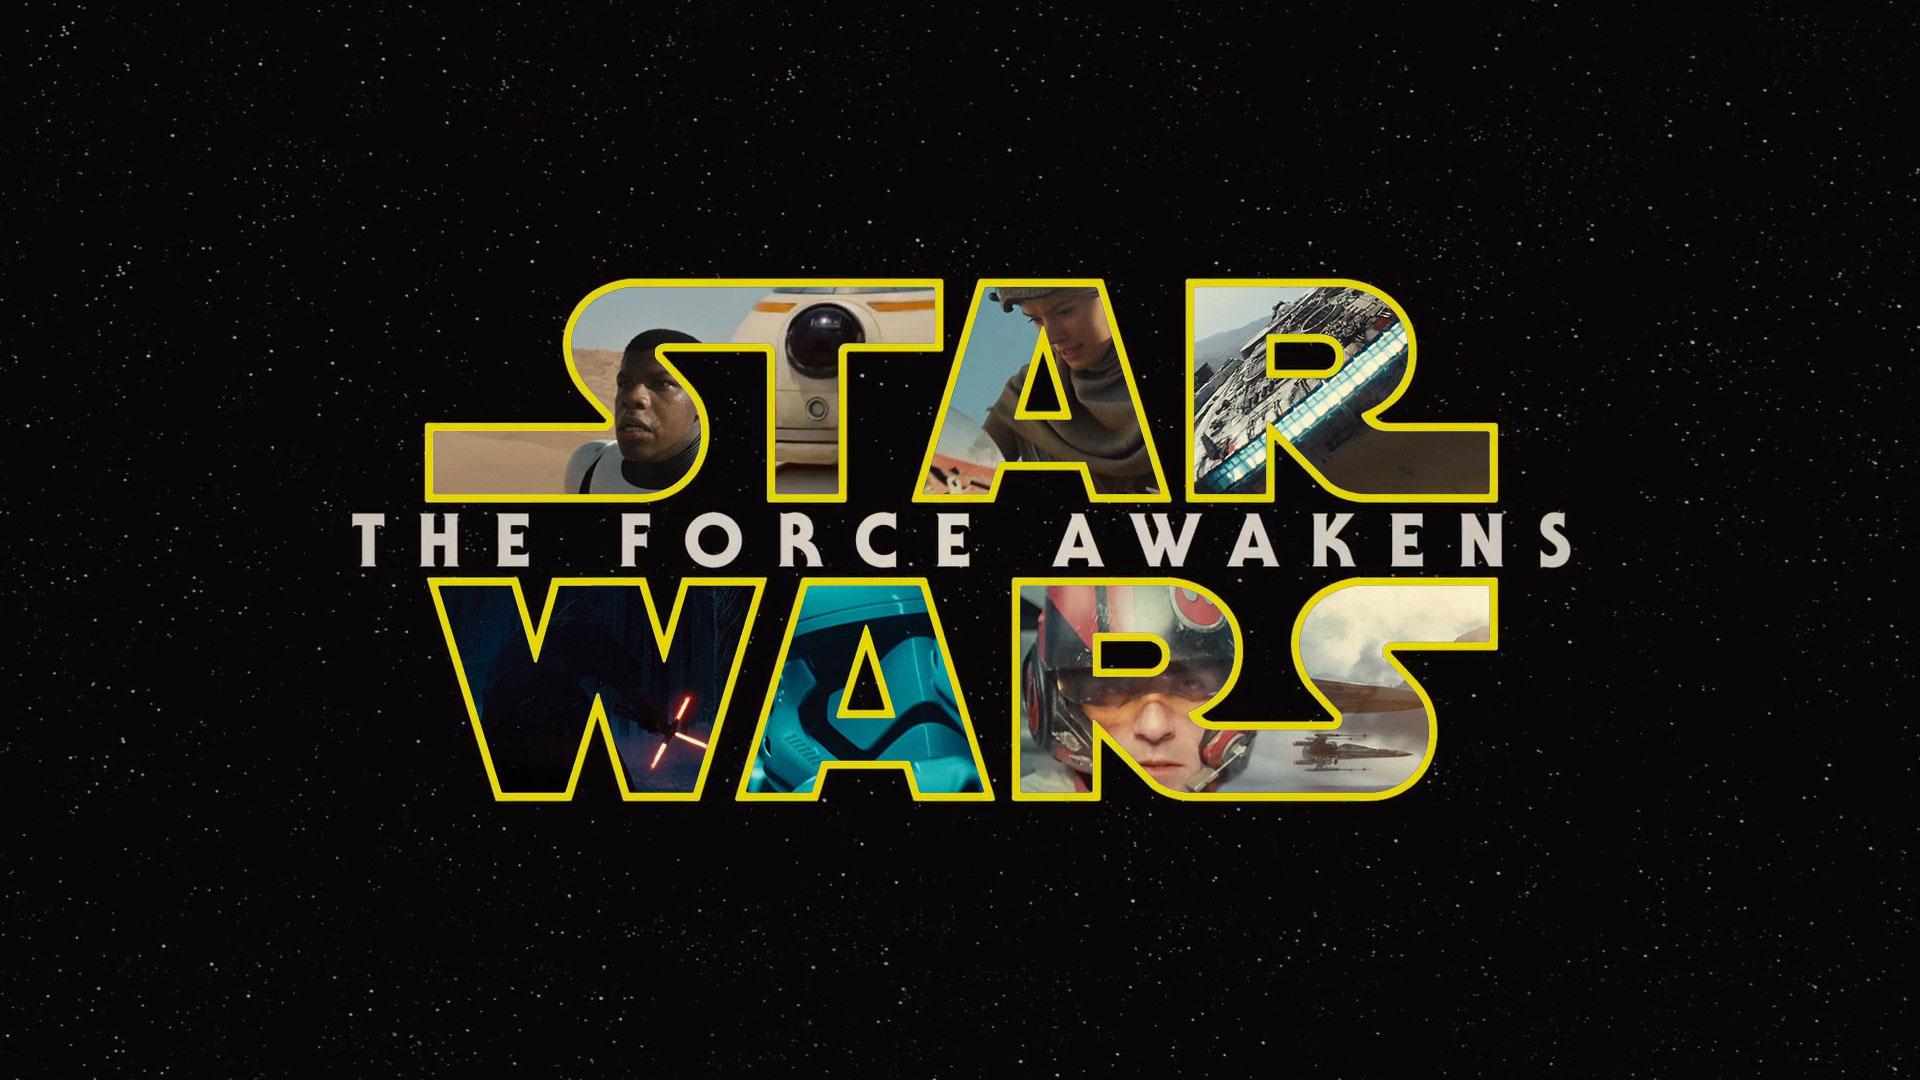 Star Wars The Force Awakens Movie